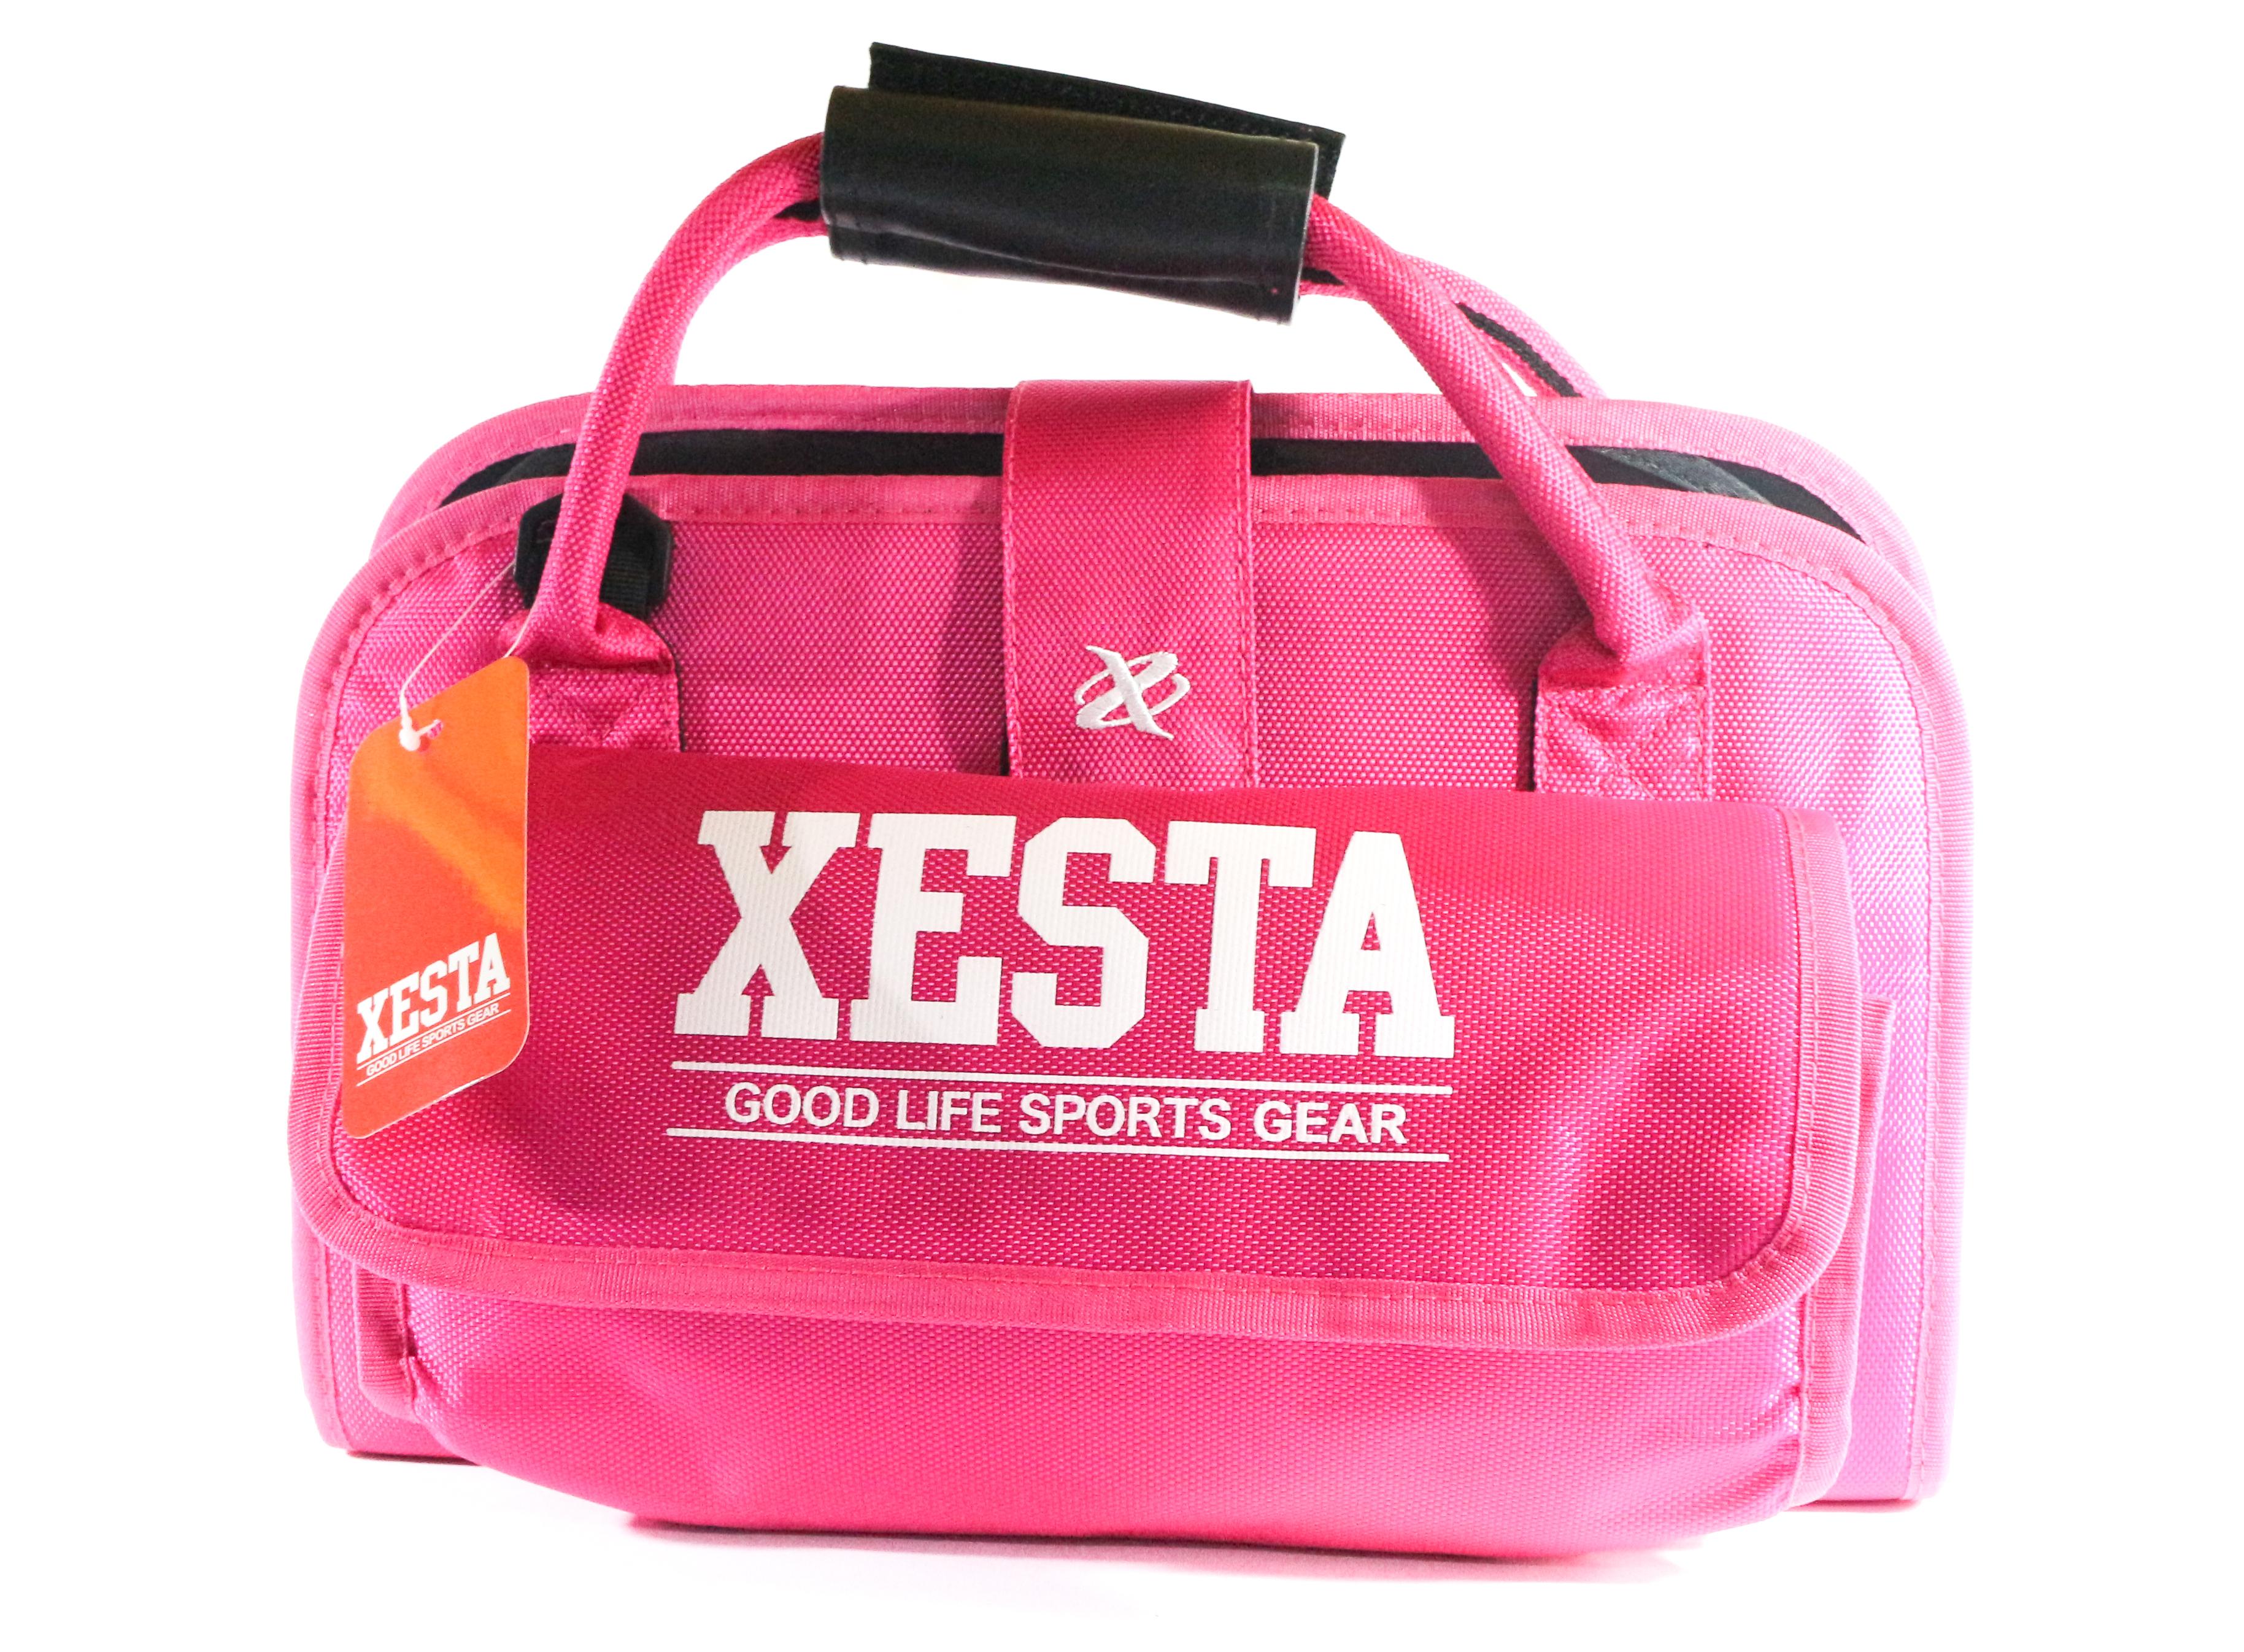 Sale Xesta System Jig Bag 37 x 23 x 9 cm Pink (7496)